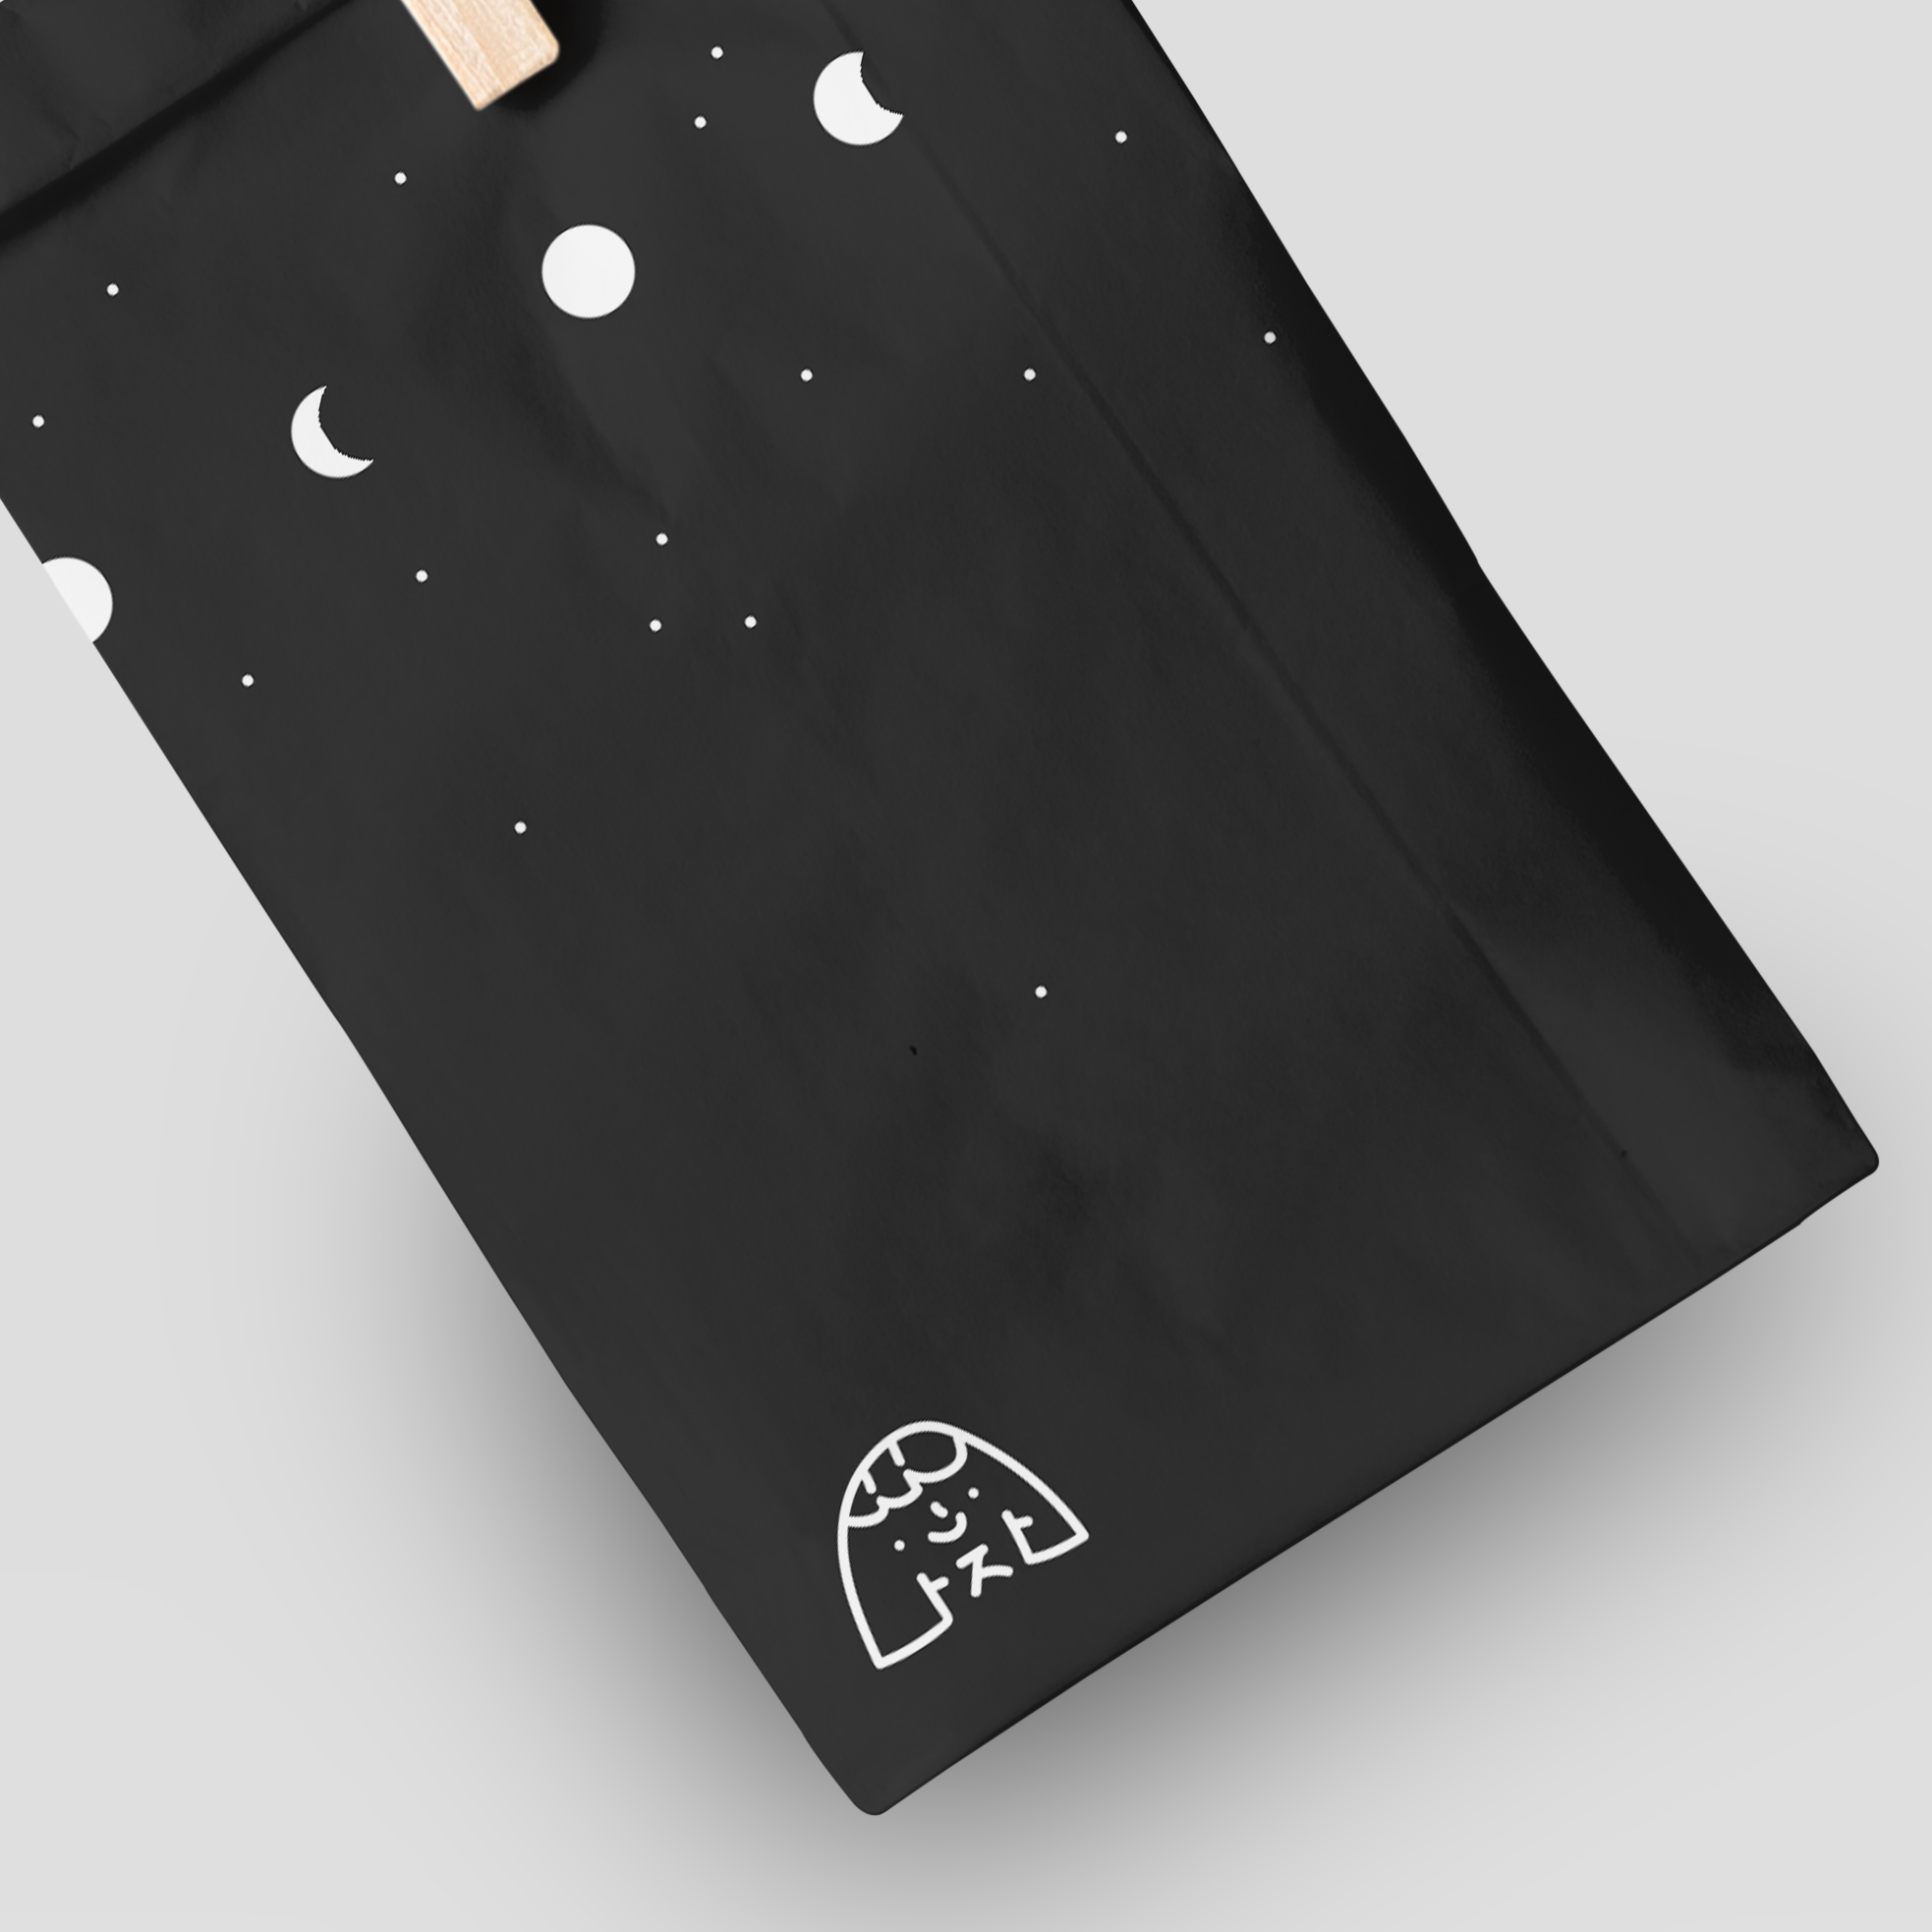 Toasto Black bag.jpg